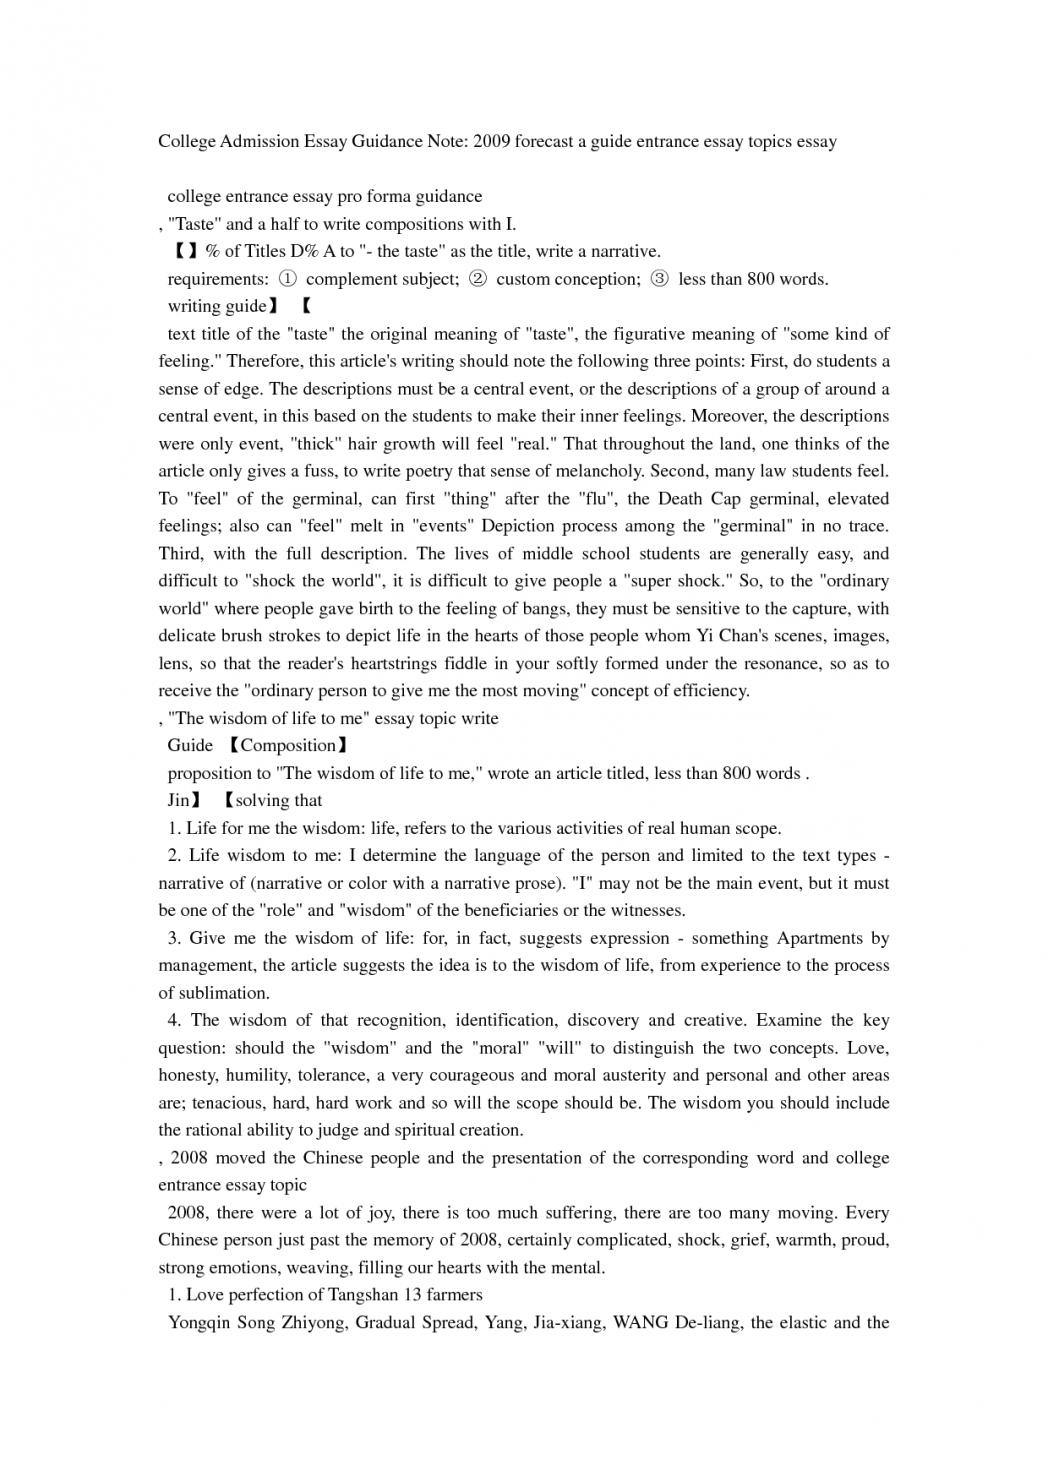 003 Essay Example Social Justice Controversial Topics List Topic Xdaqu Argumentative Singular Good Prompts Prompt Full